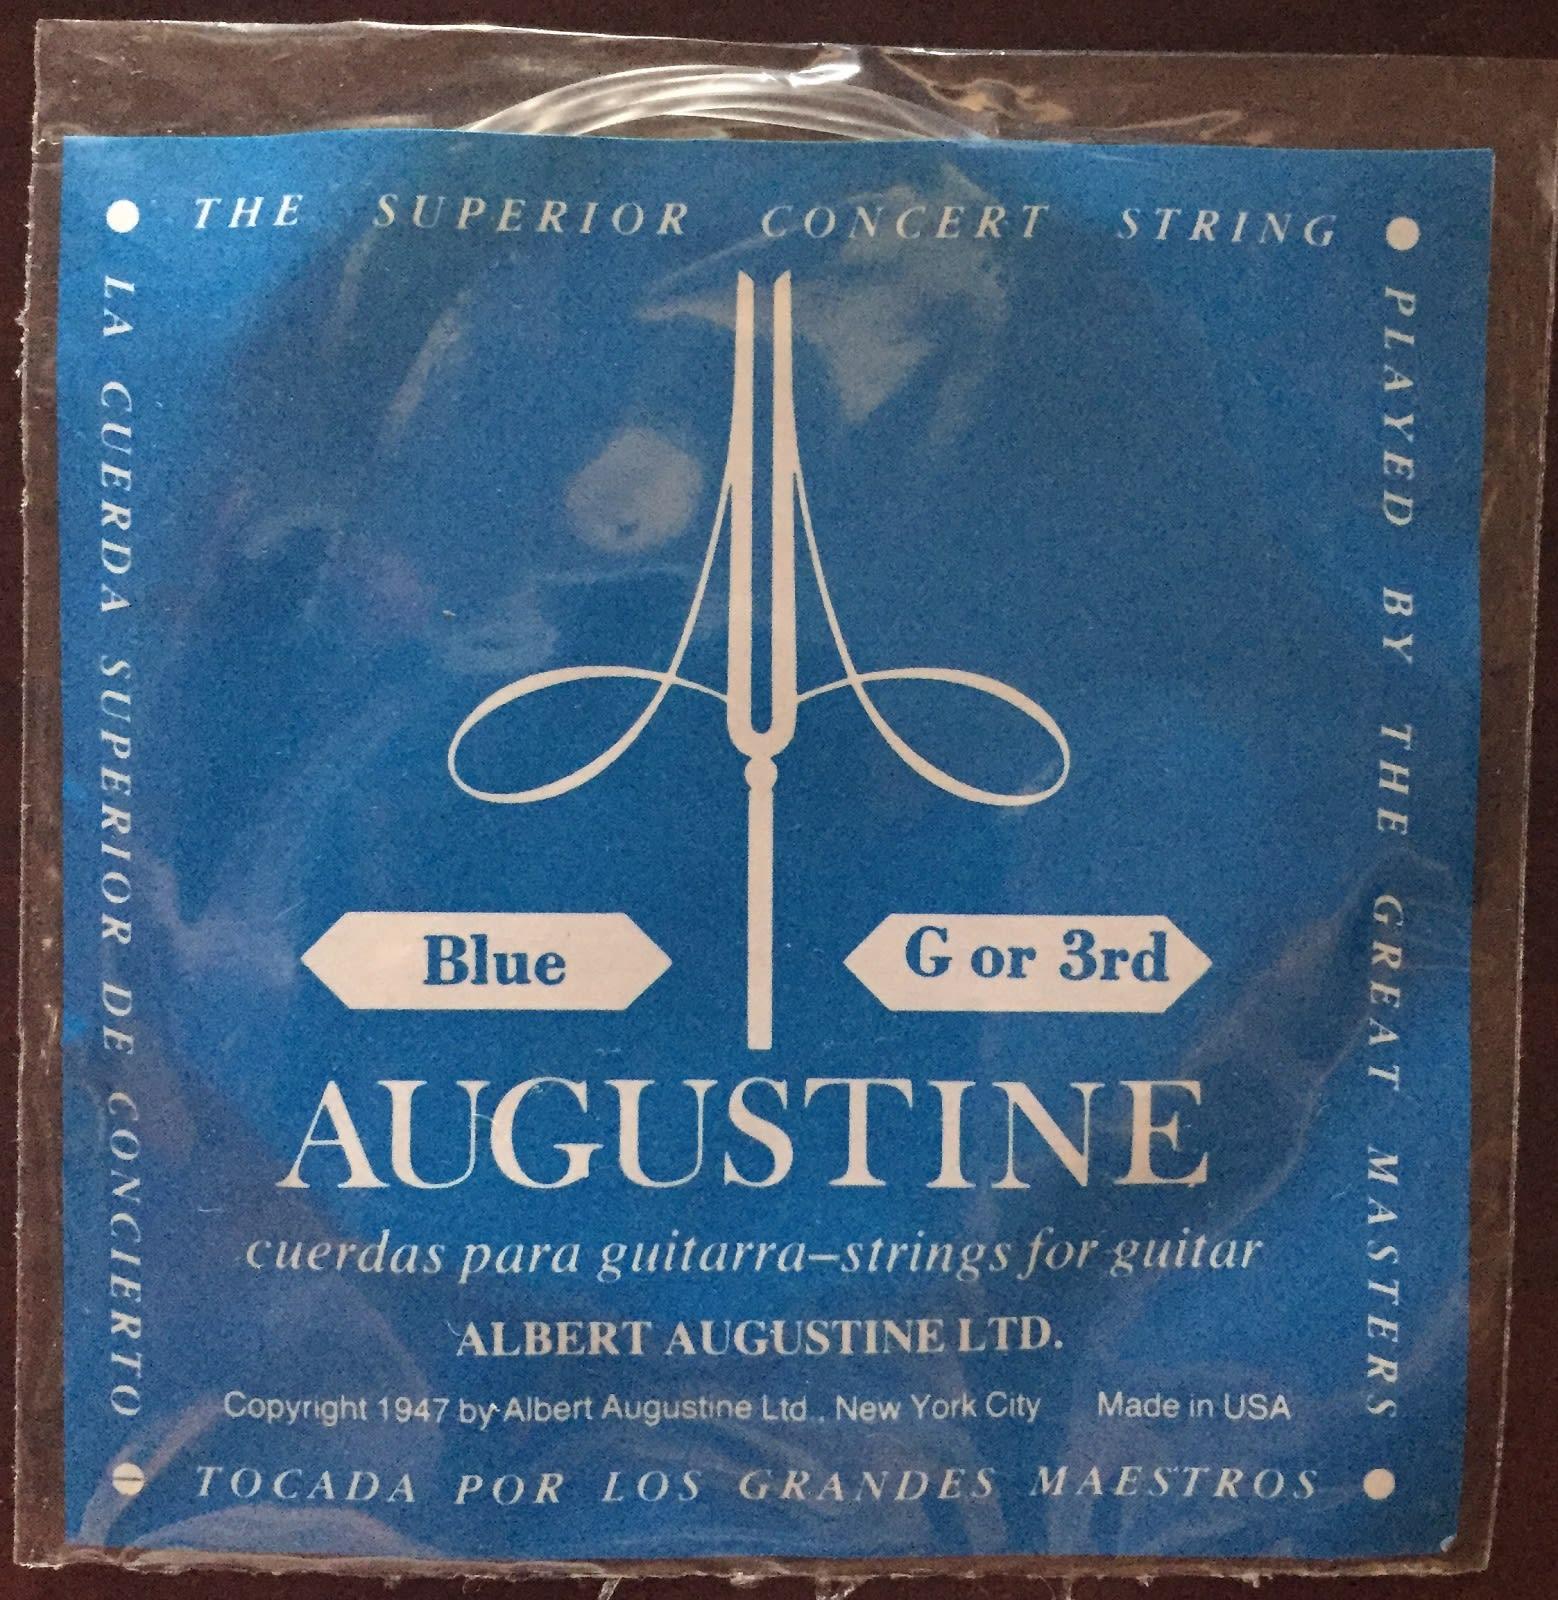 Augustine Blue - 3rd string (G)